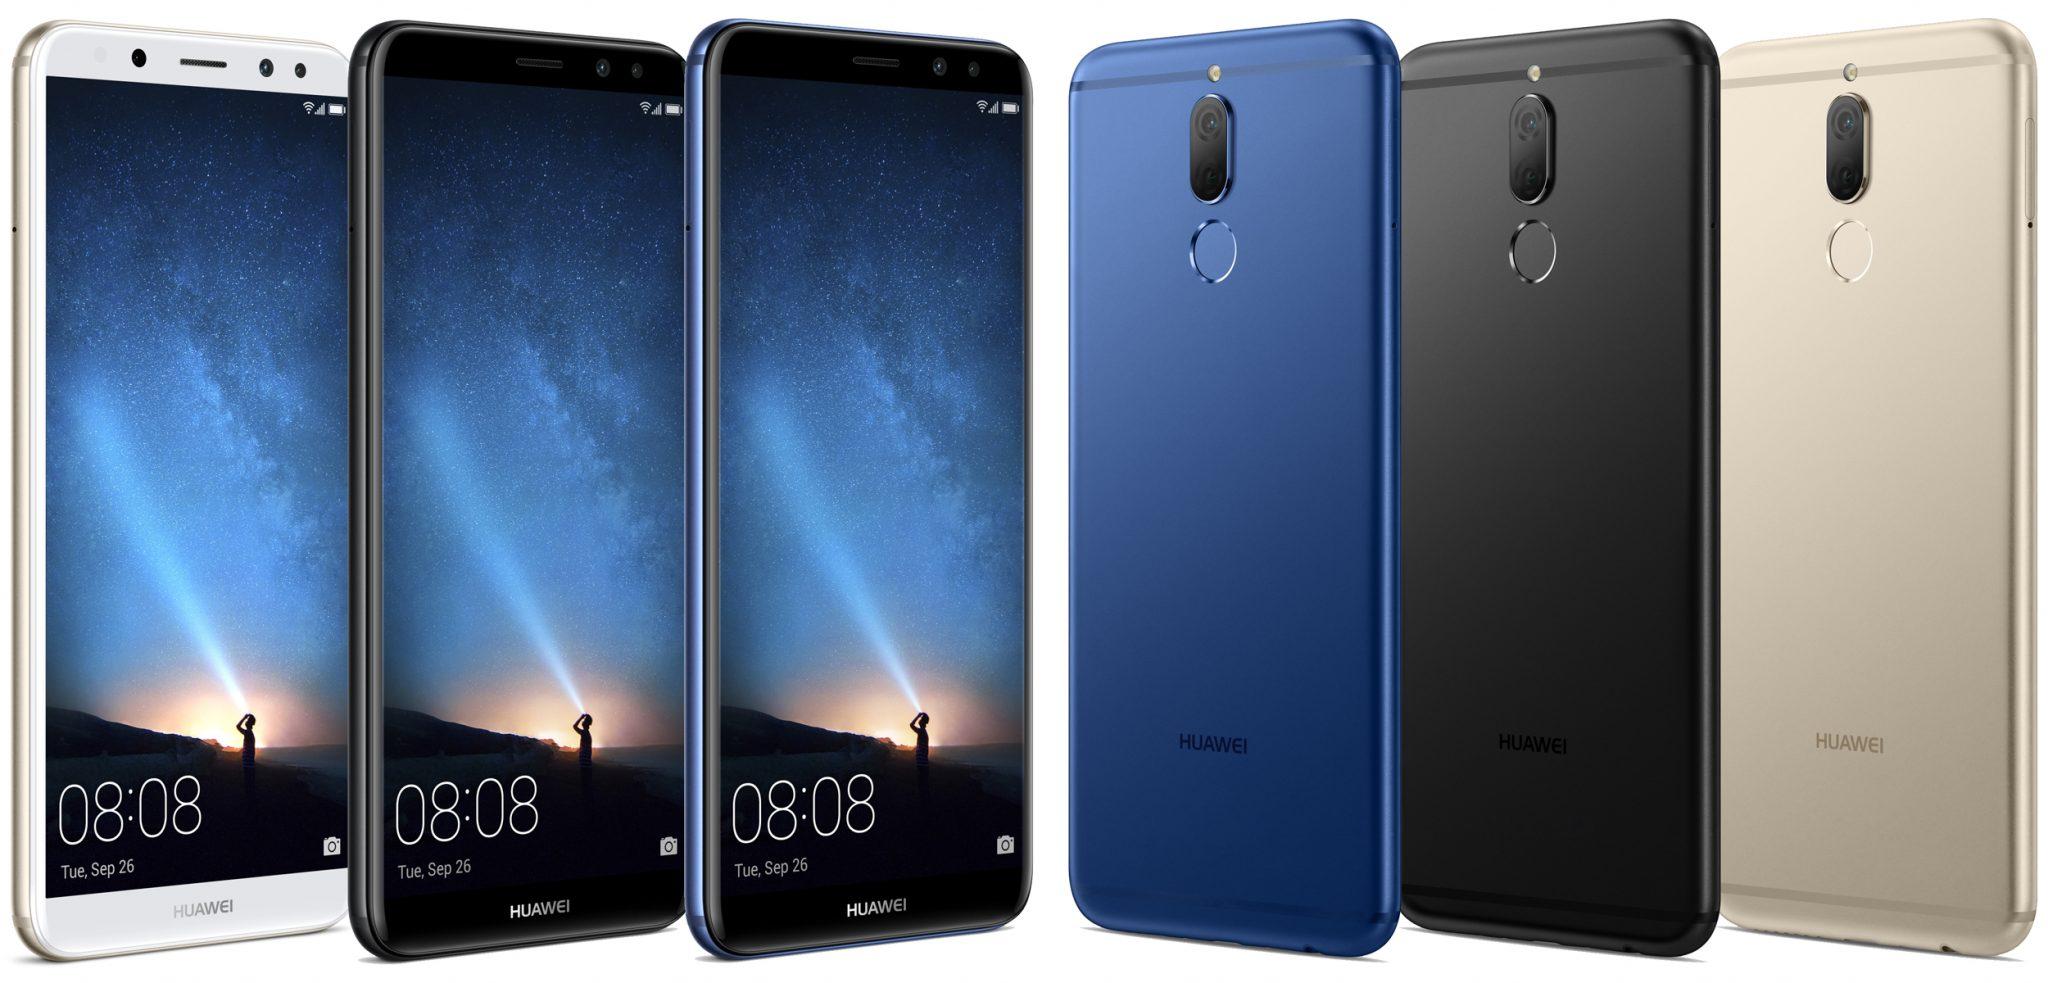 http://droidholic.com/wp-content/uploads/2017/09/Huawei-Mate-10-Lite.jpg